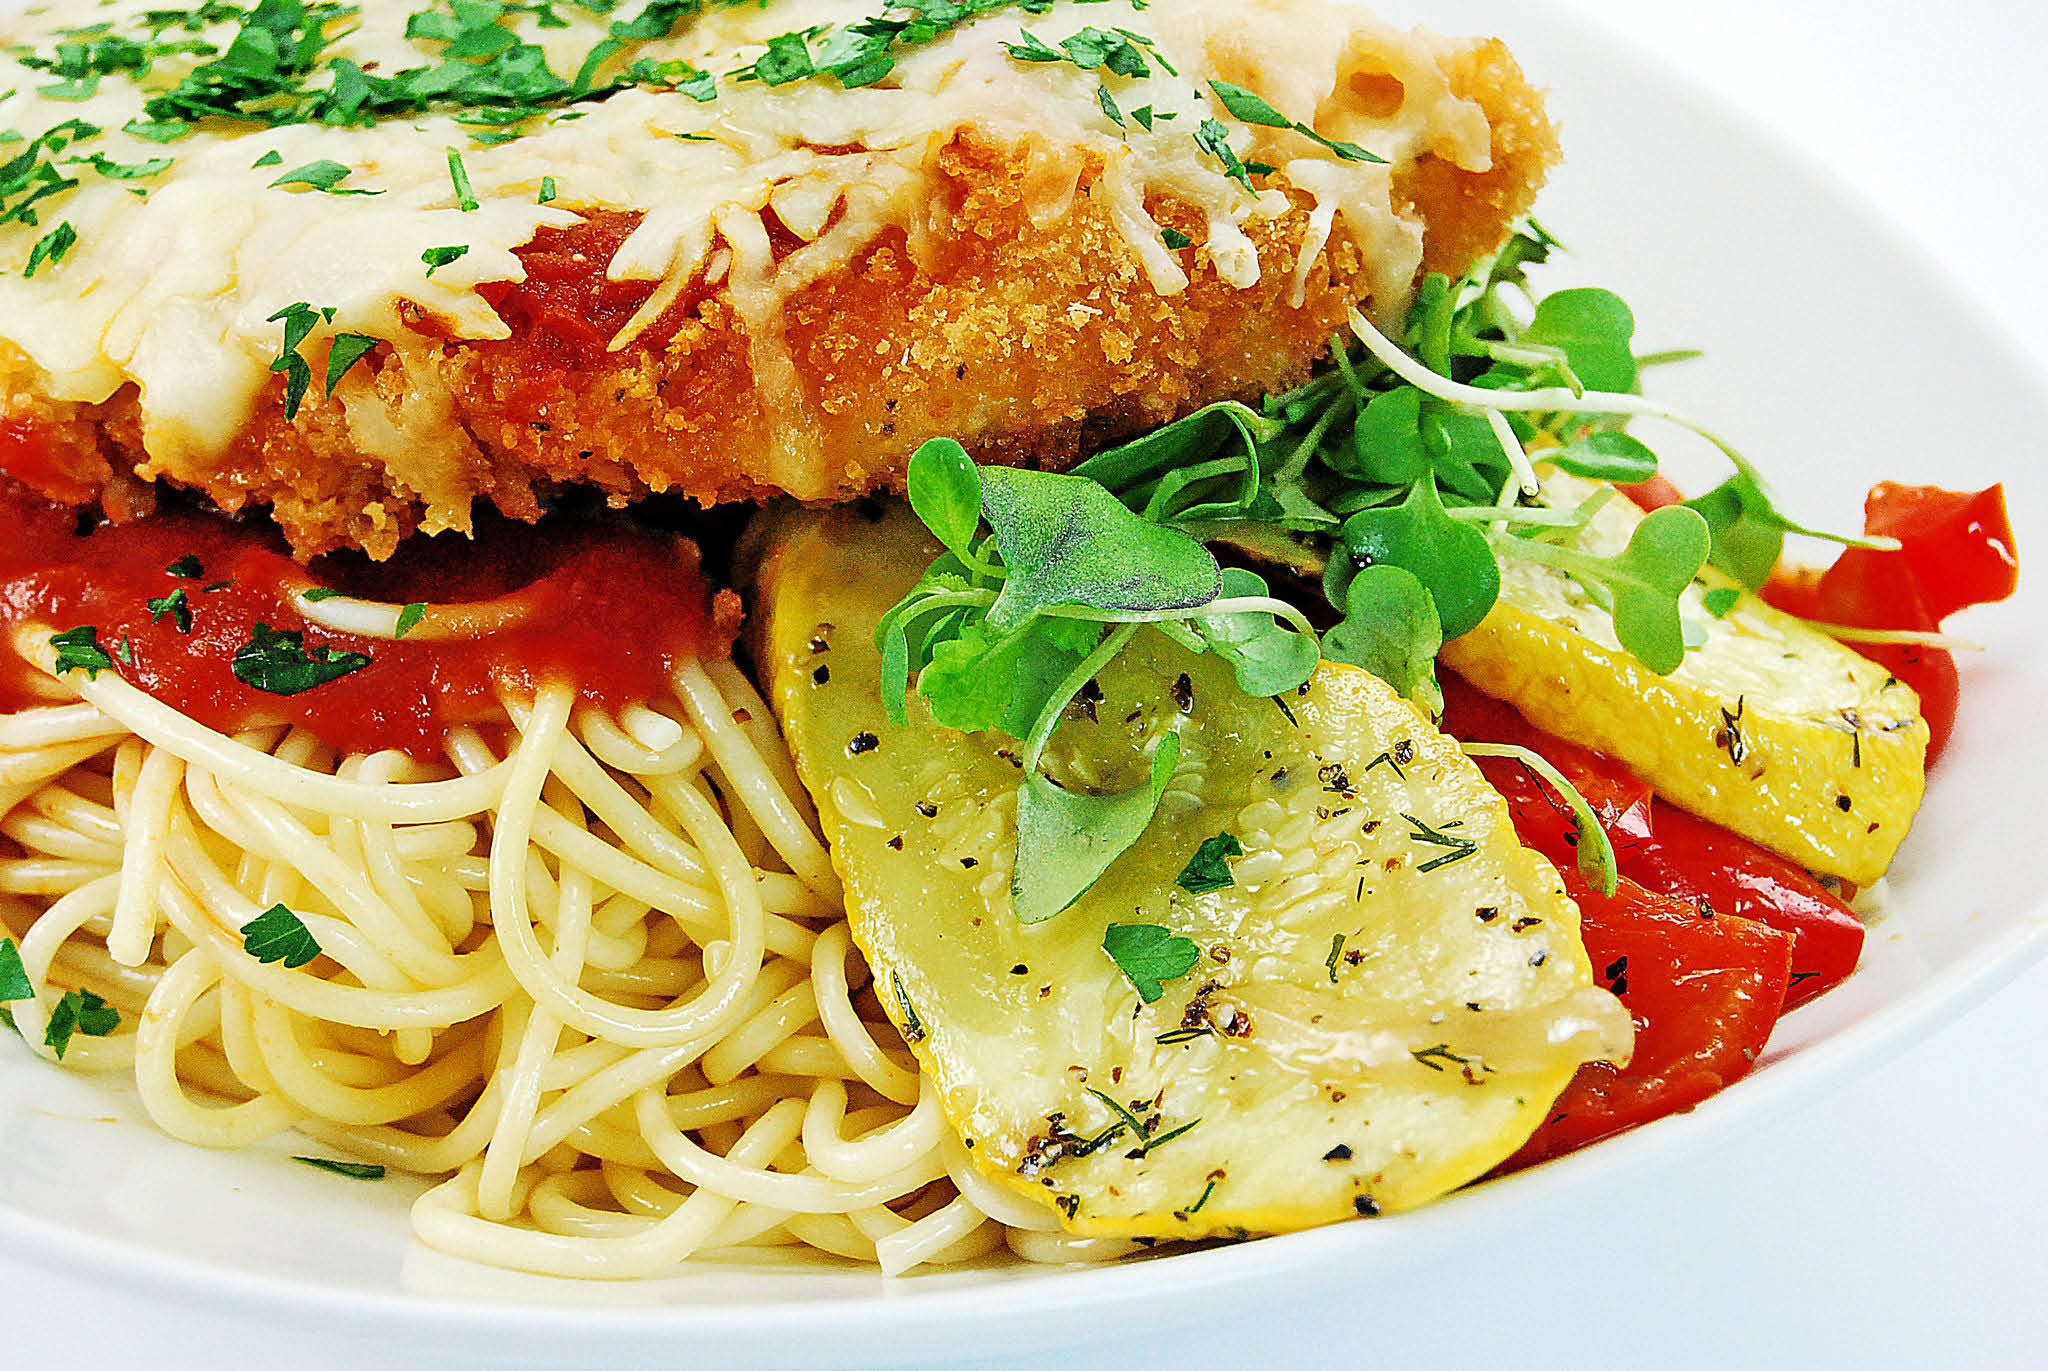 modern palate, modern palate valpak, valpak, healthy, dinner, valpak food, delivery, catering